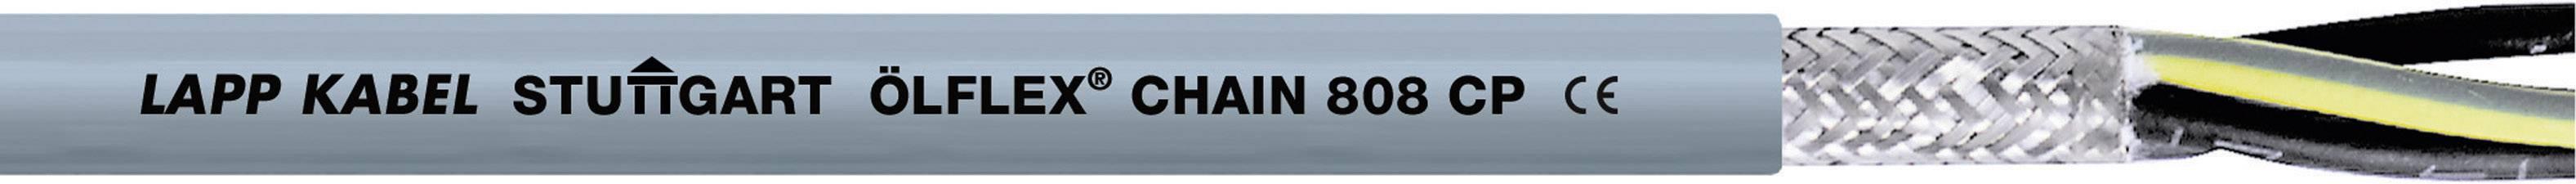 Žíla kabelu LappKabel ÖLFLEX CHAIN 808 CP 2X1,0 (1027767), 2x 1 mm², polyurethan, Ø 6,5 mm, stíněný, 100 m, še